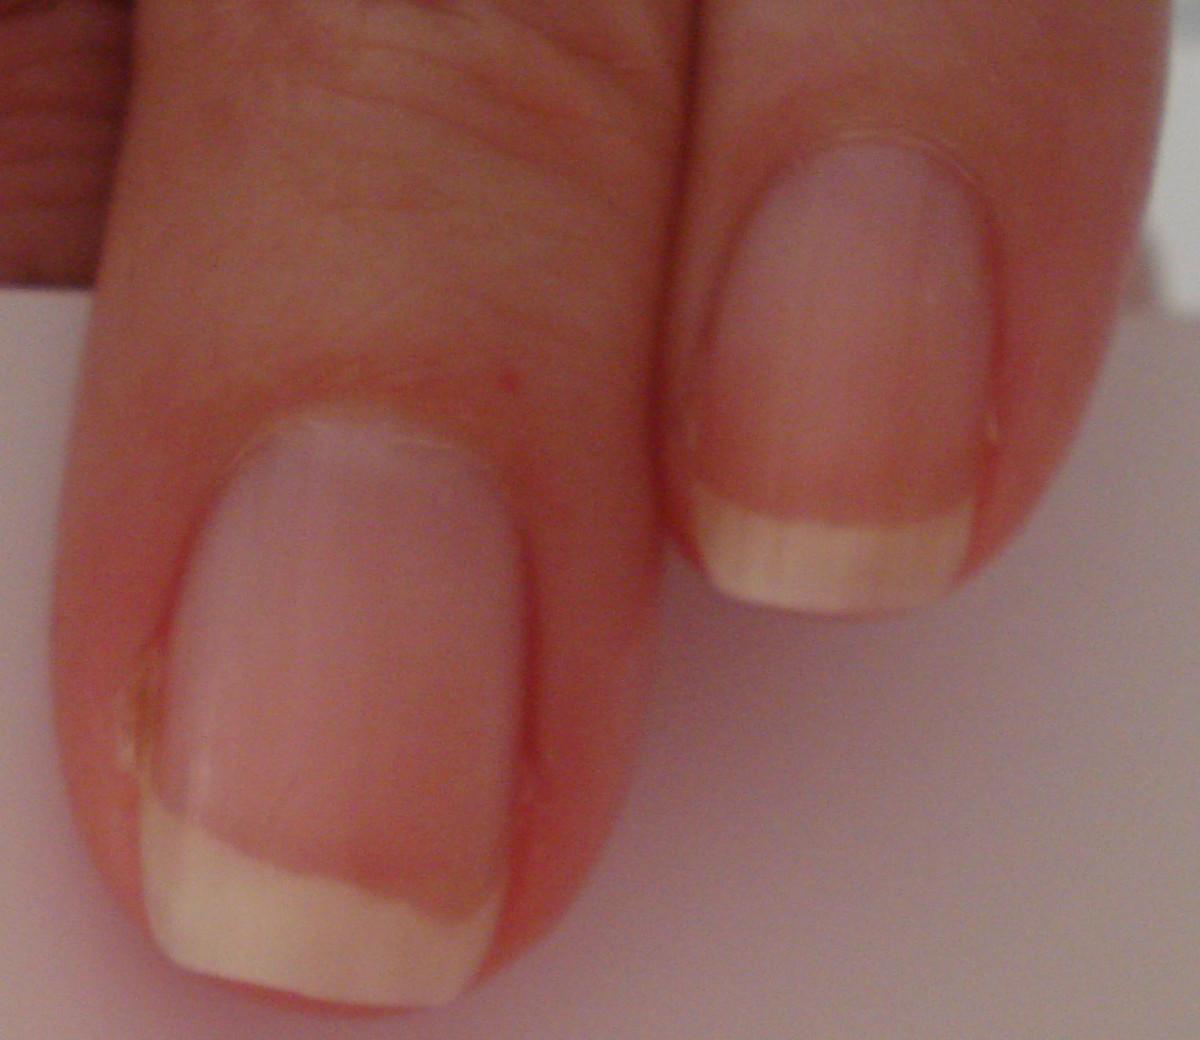 Abnormal fingernail beds following carbon monoxide poisoning